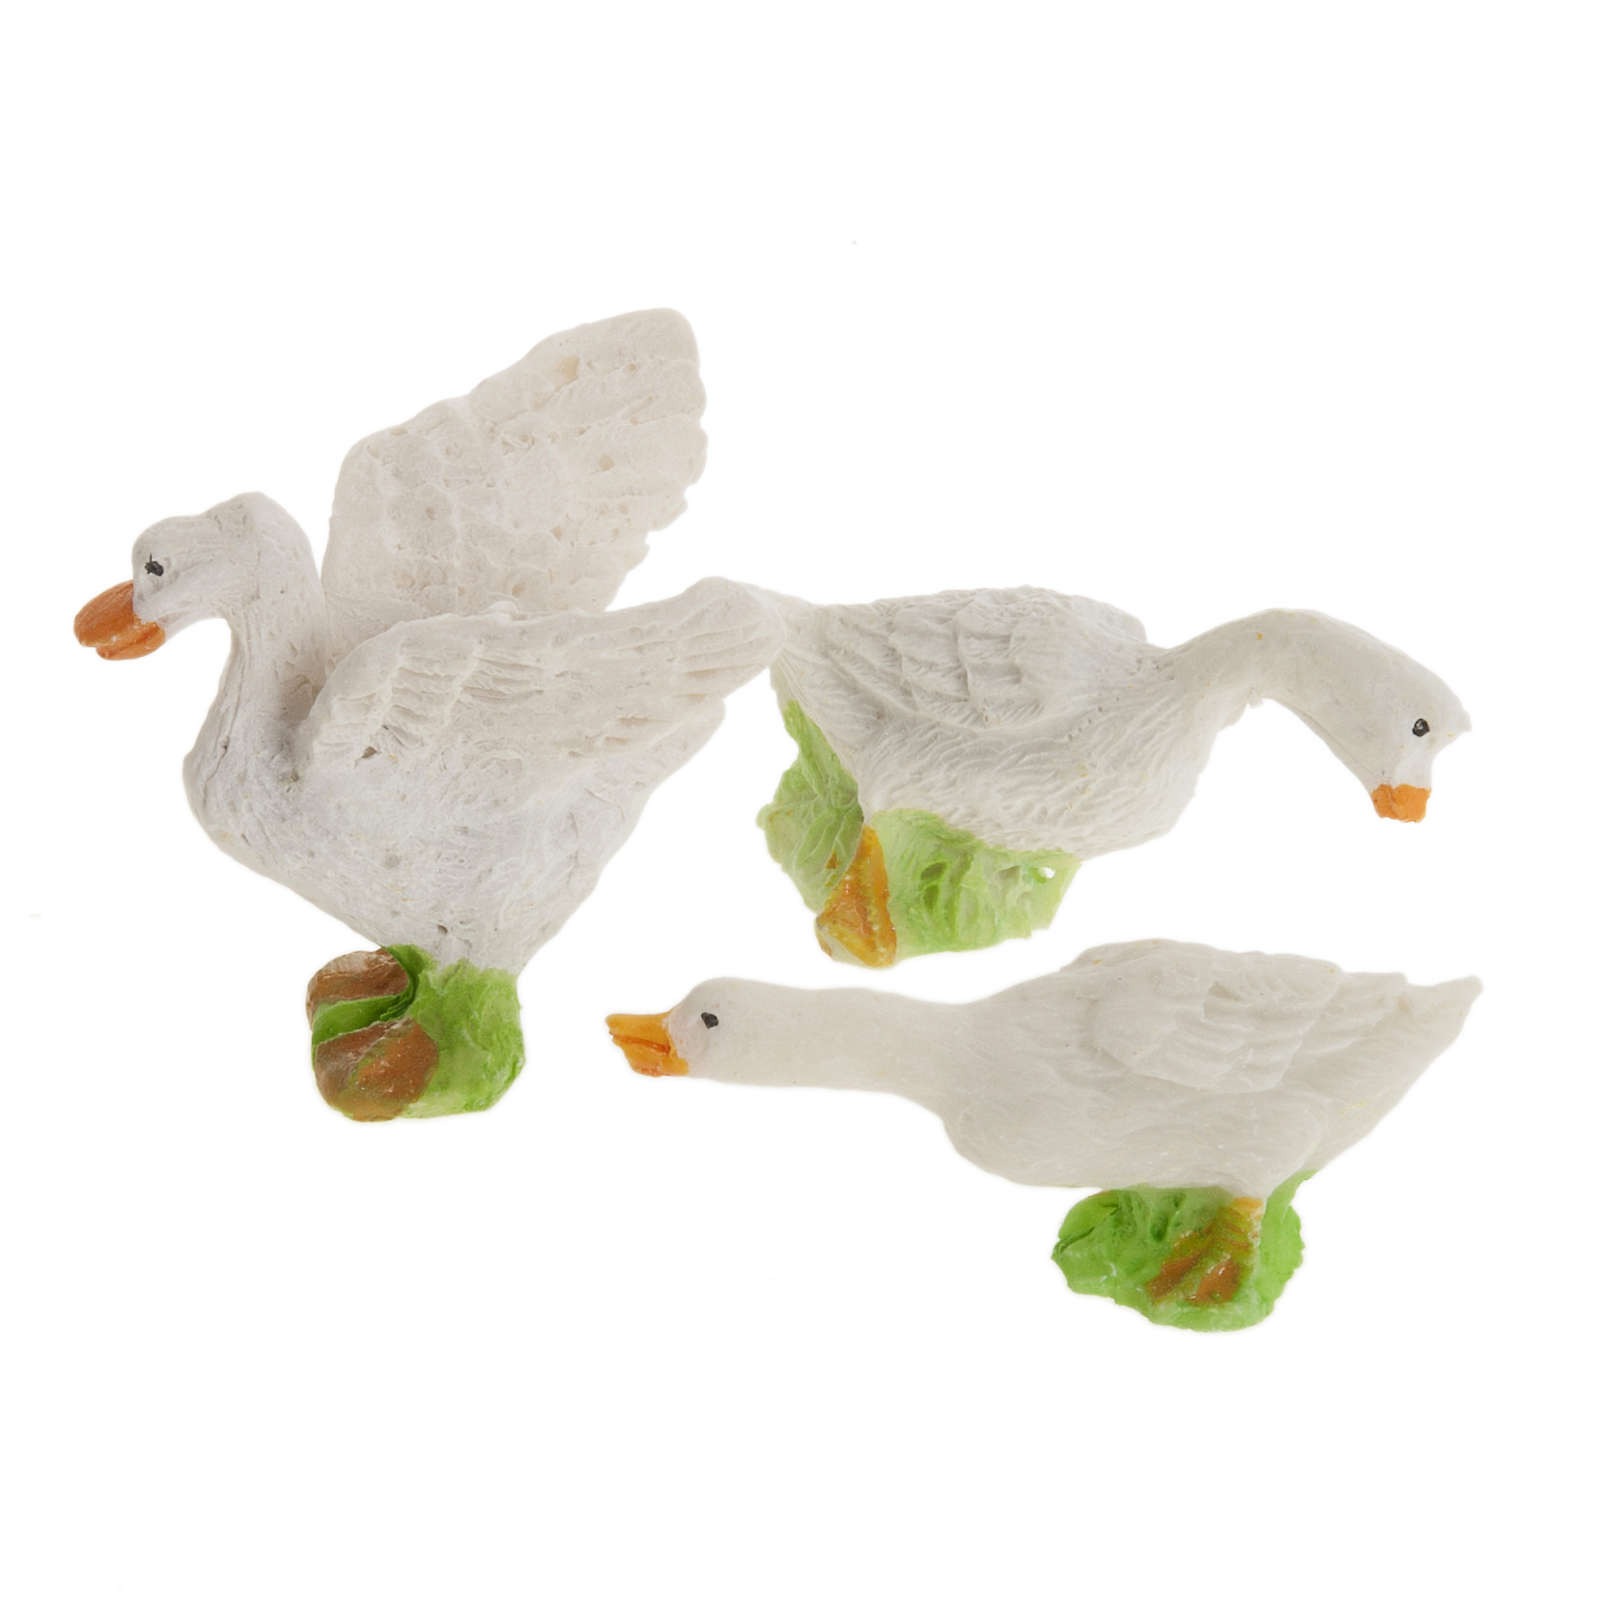 Nativity figurines, geese in resin 12cm, set of 3 3